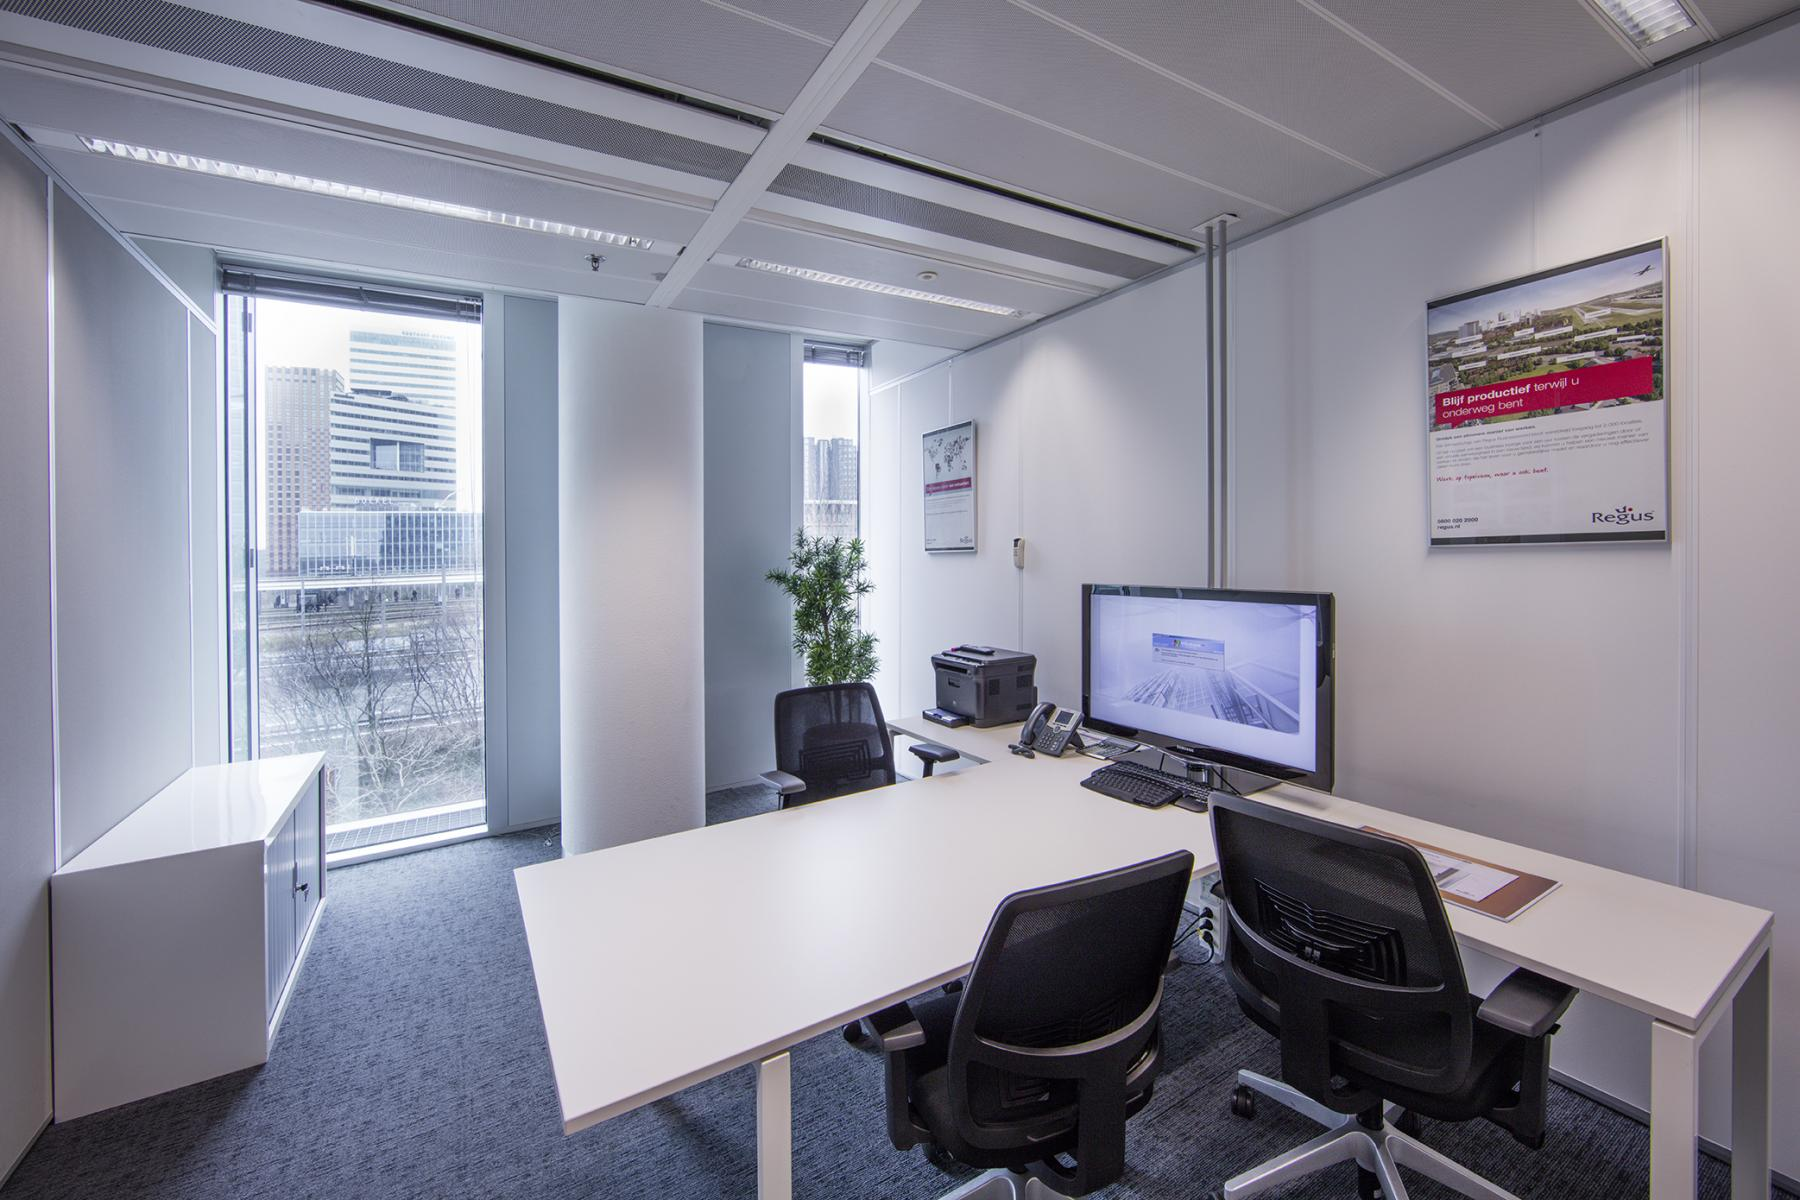 bureau tafel stoelen ingericht ramen uitzicht wtc amsterdam kantoor zuidas zuidplein huur SKEPP